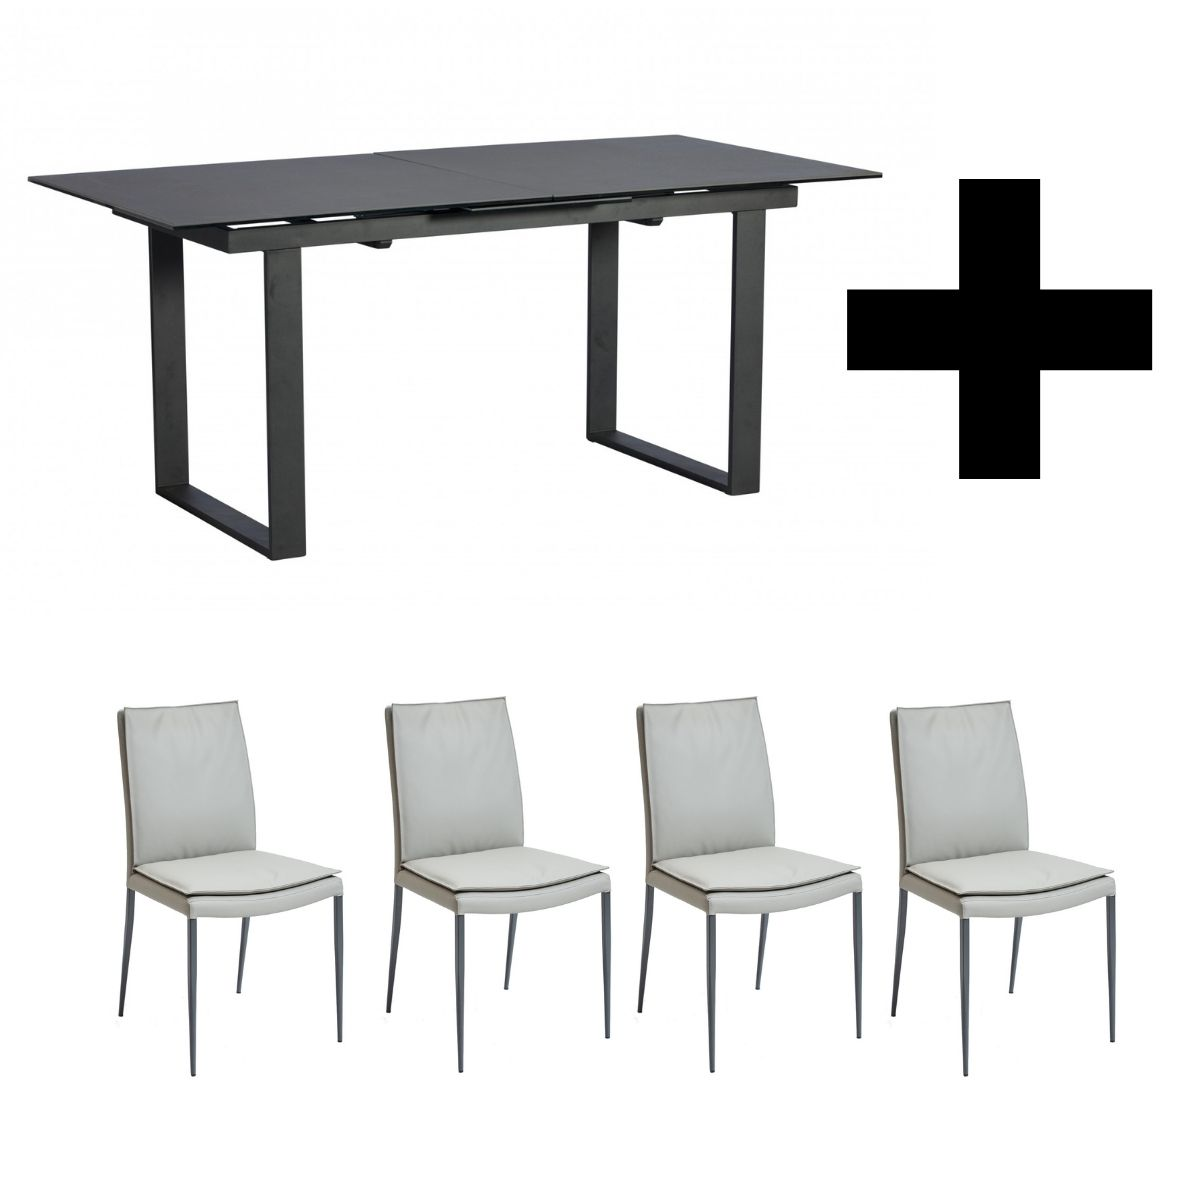 Monterrey Extending Table & 4 Dark Grey Dining Chairs - Bundle Deal